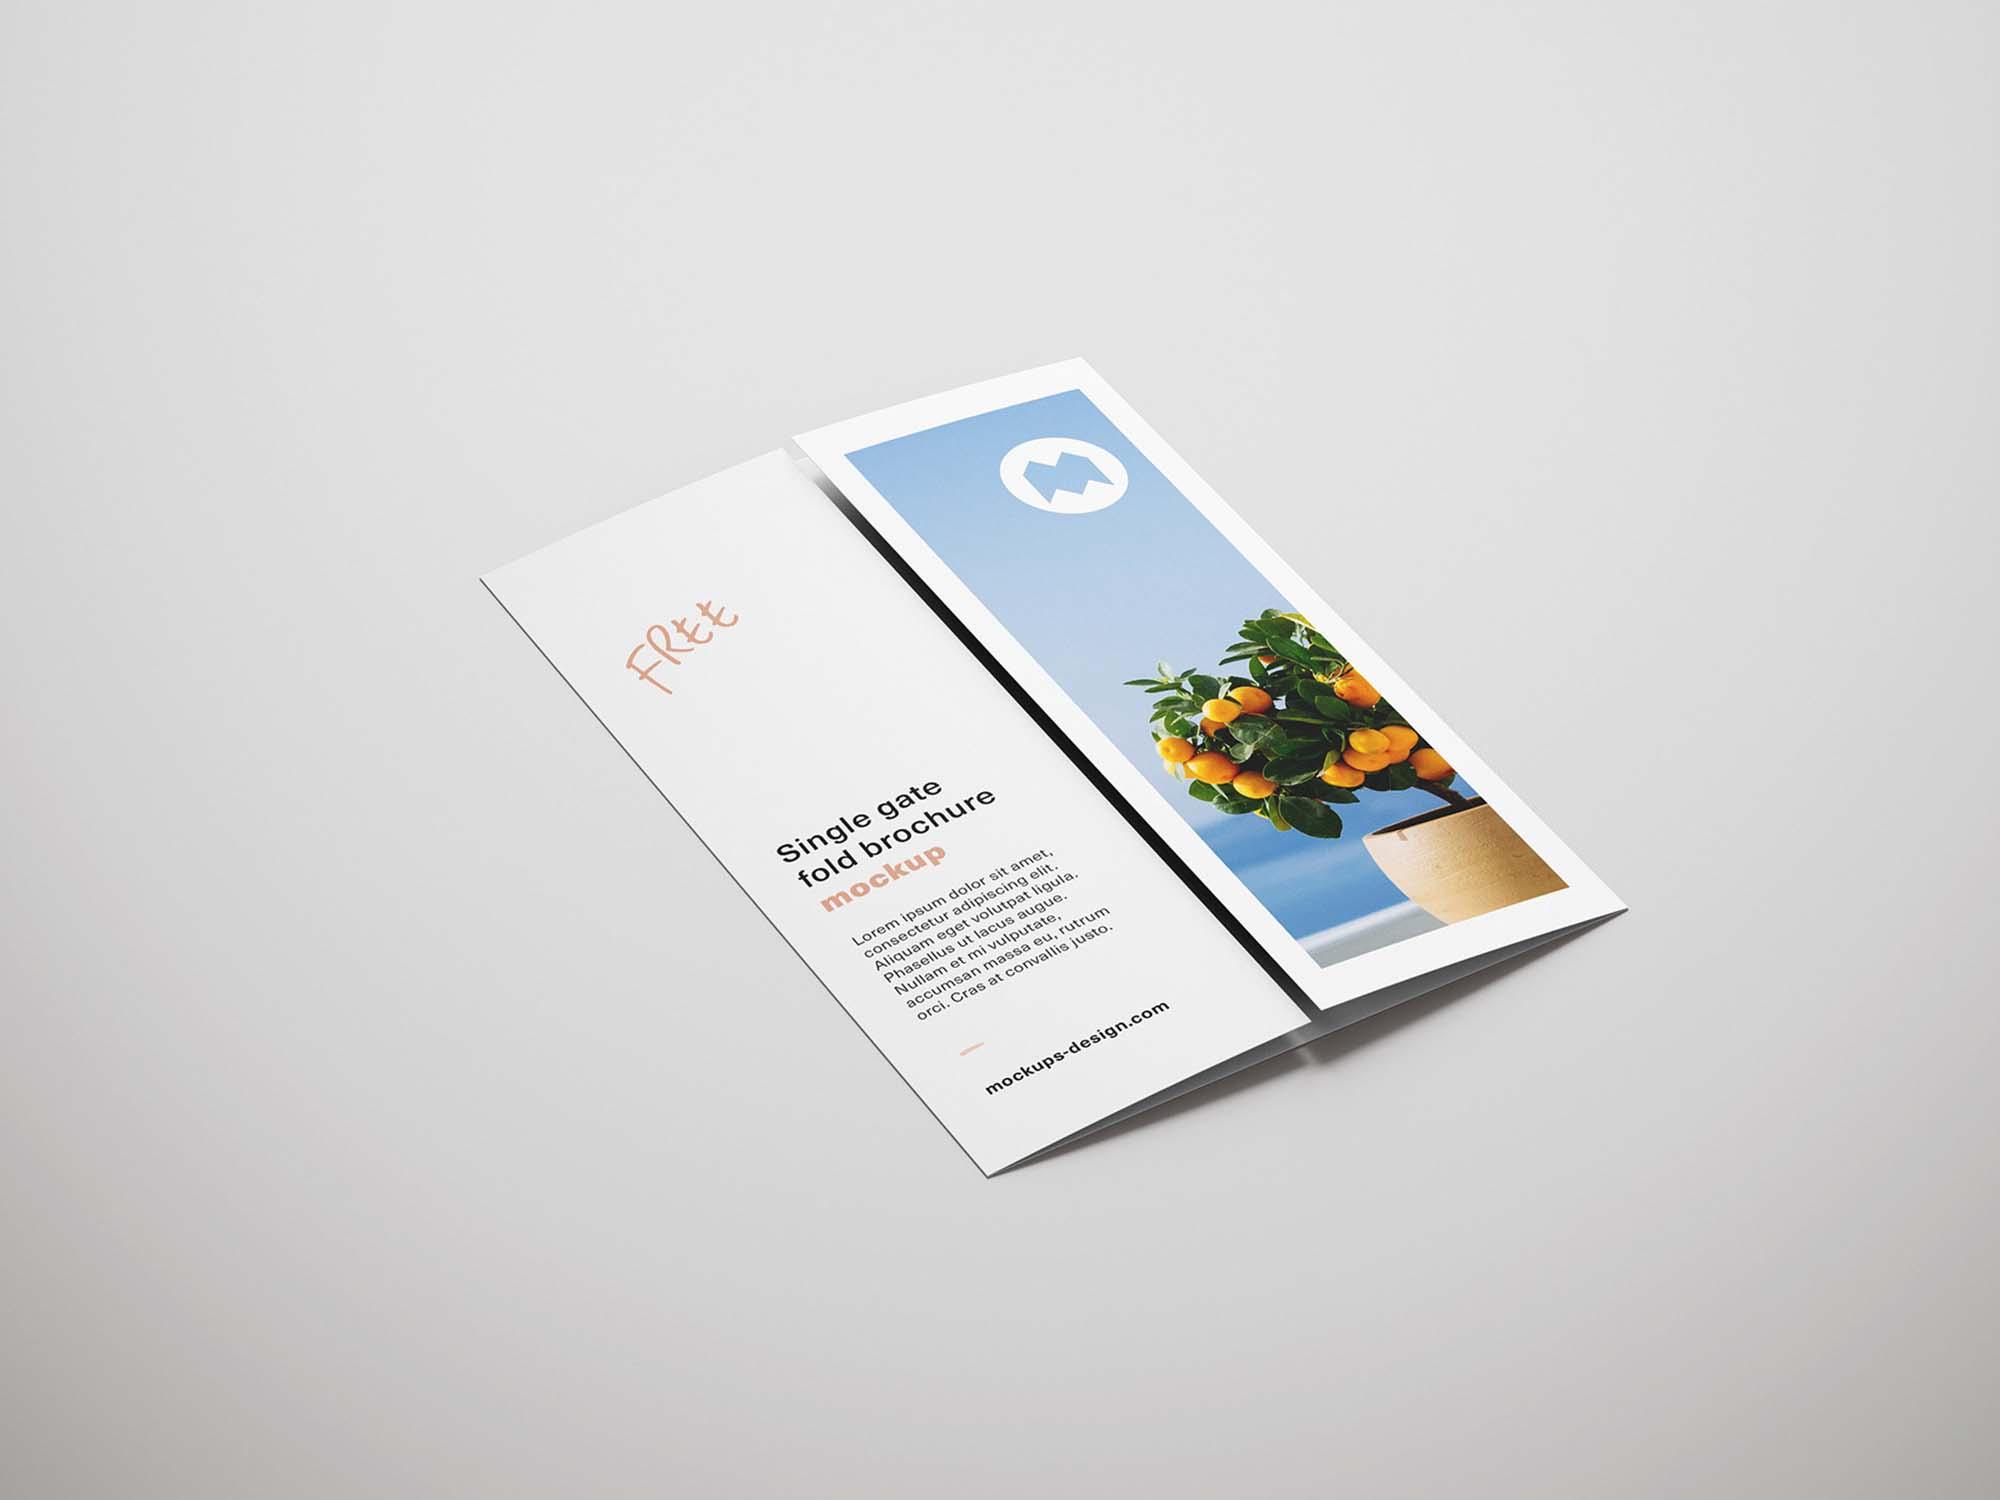 free single gatefold brochure mockup psd